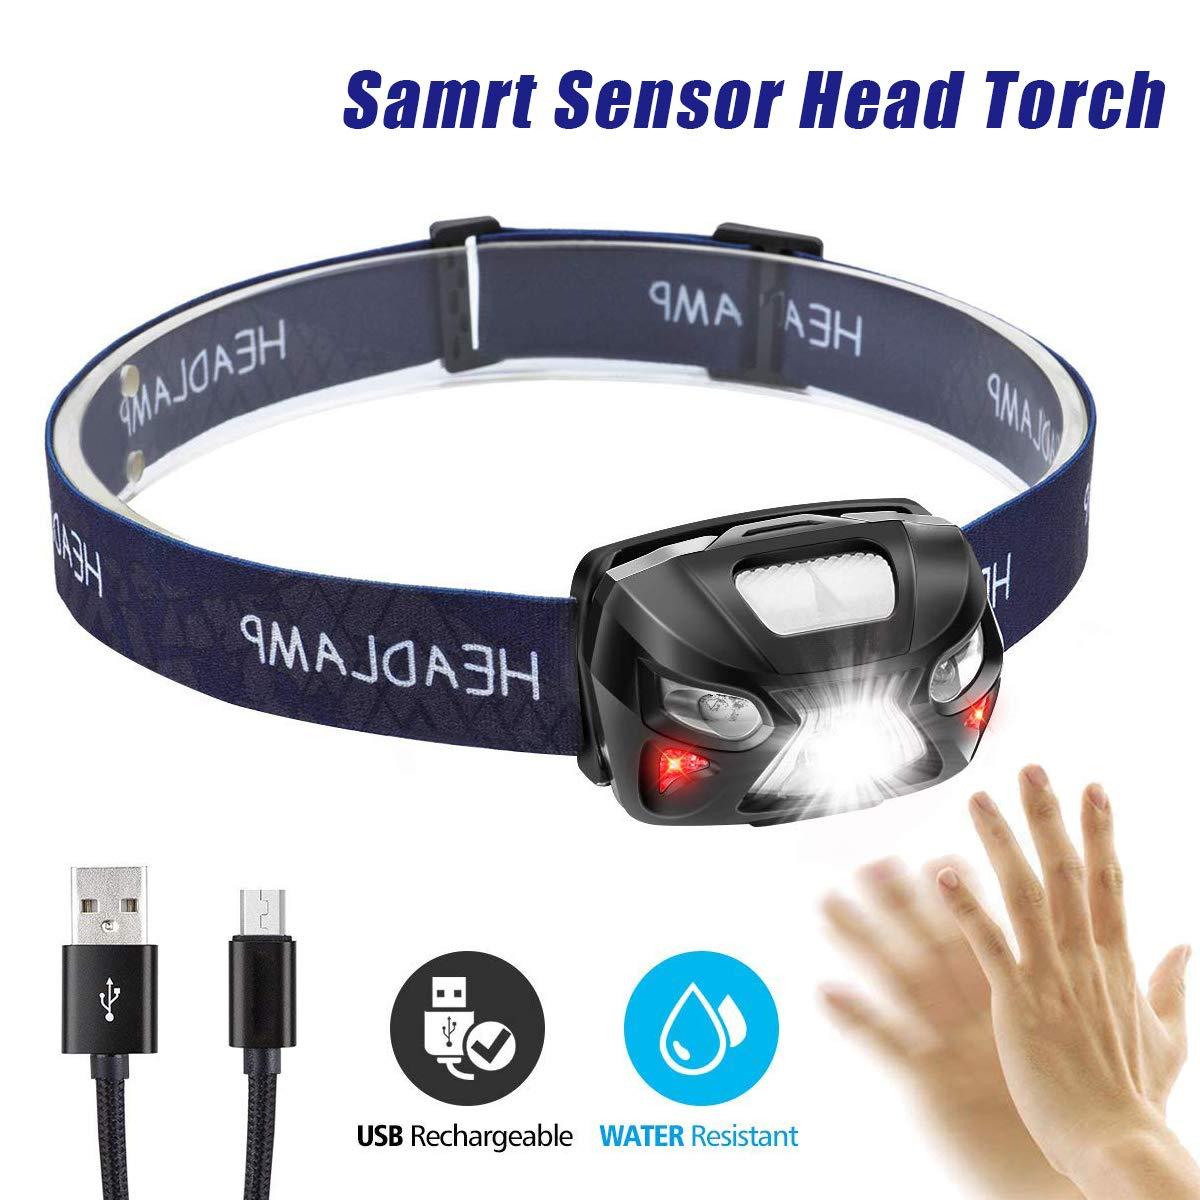 Unisex Bright LED Headband White with Integrated LED USB Charged